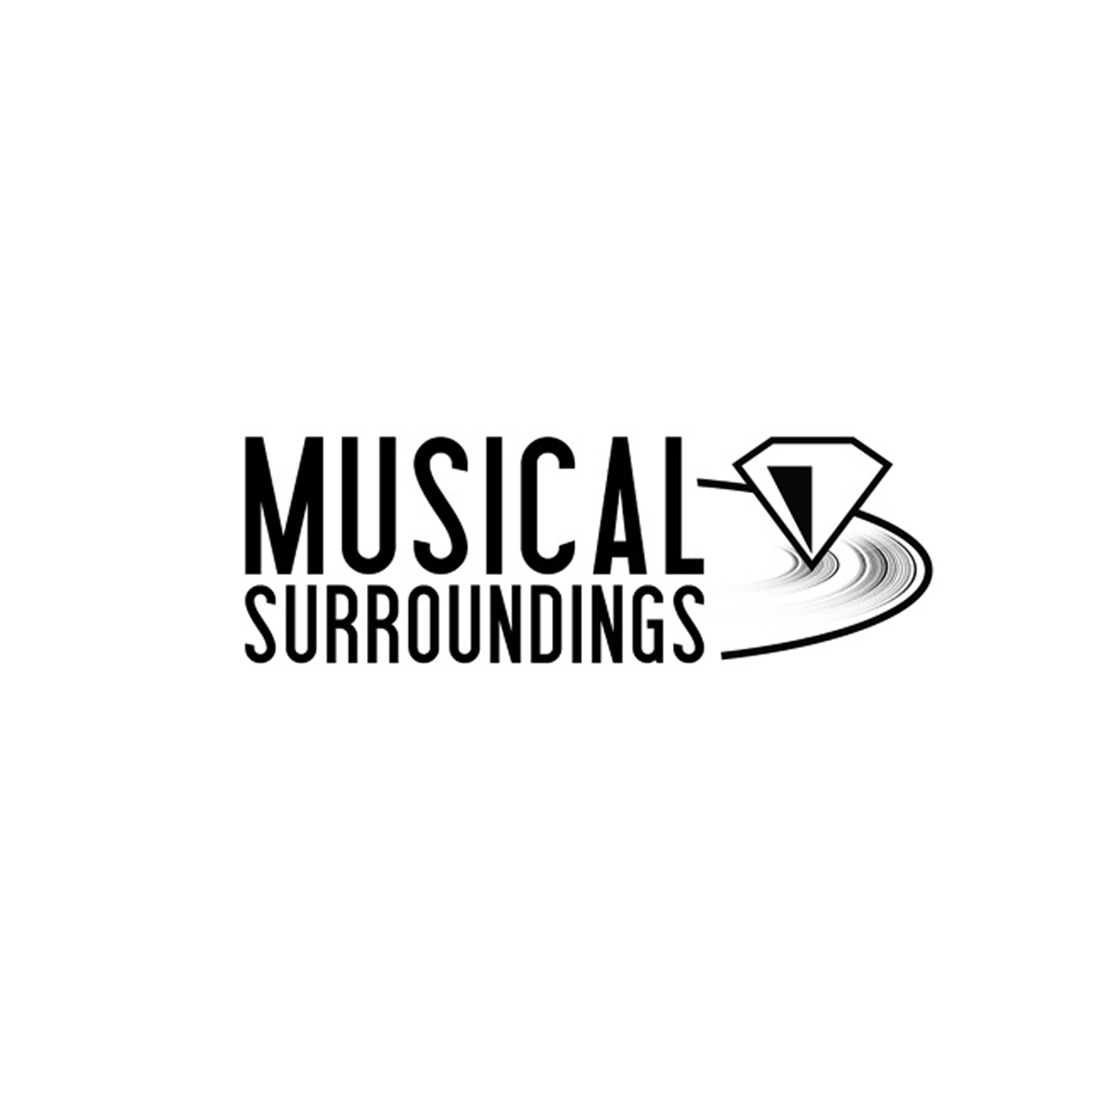 Musical Surroundings